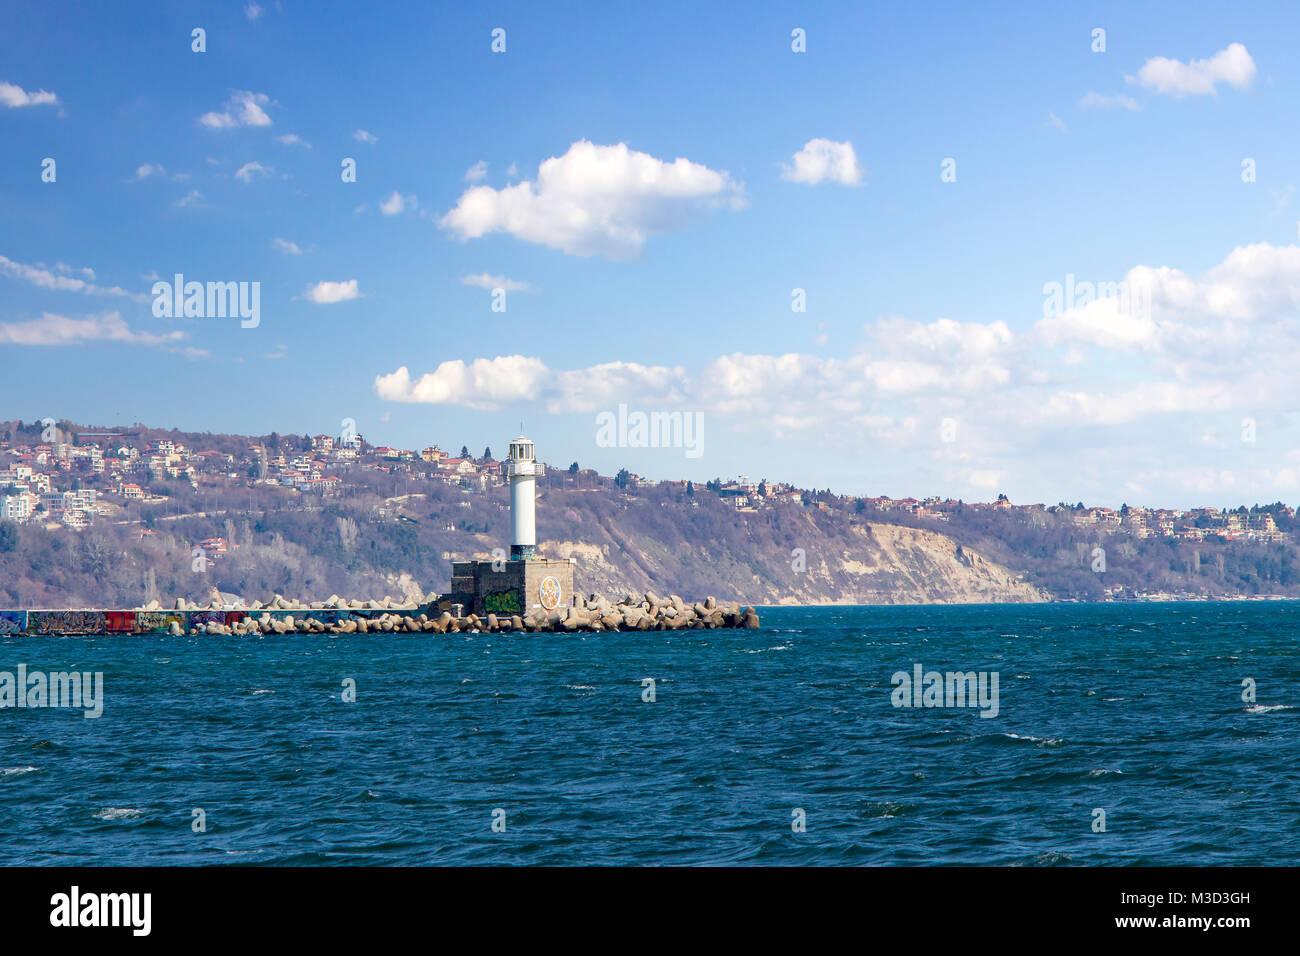 Black Sea Lighthouse Stock Photos Amp Black Sea Lighthouse